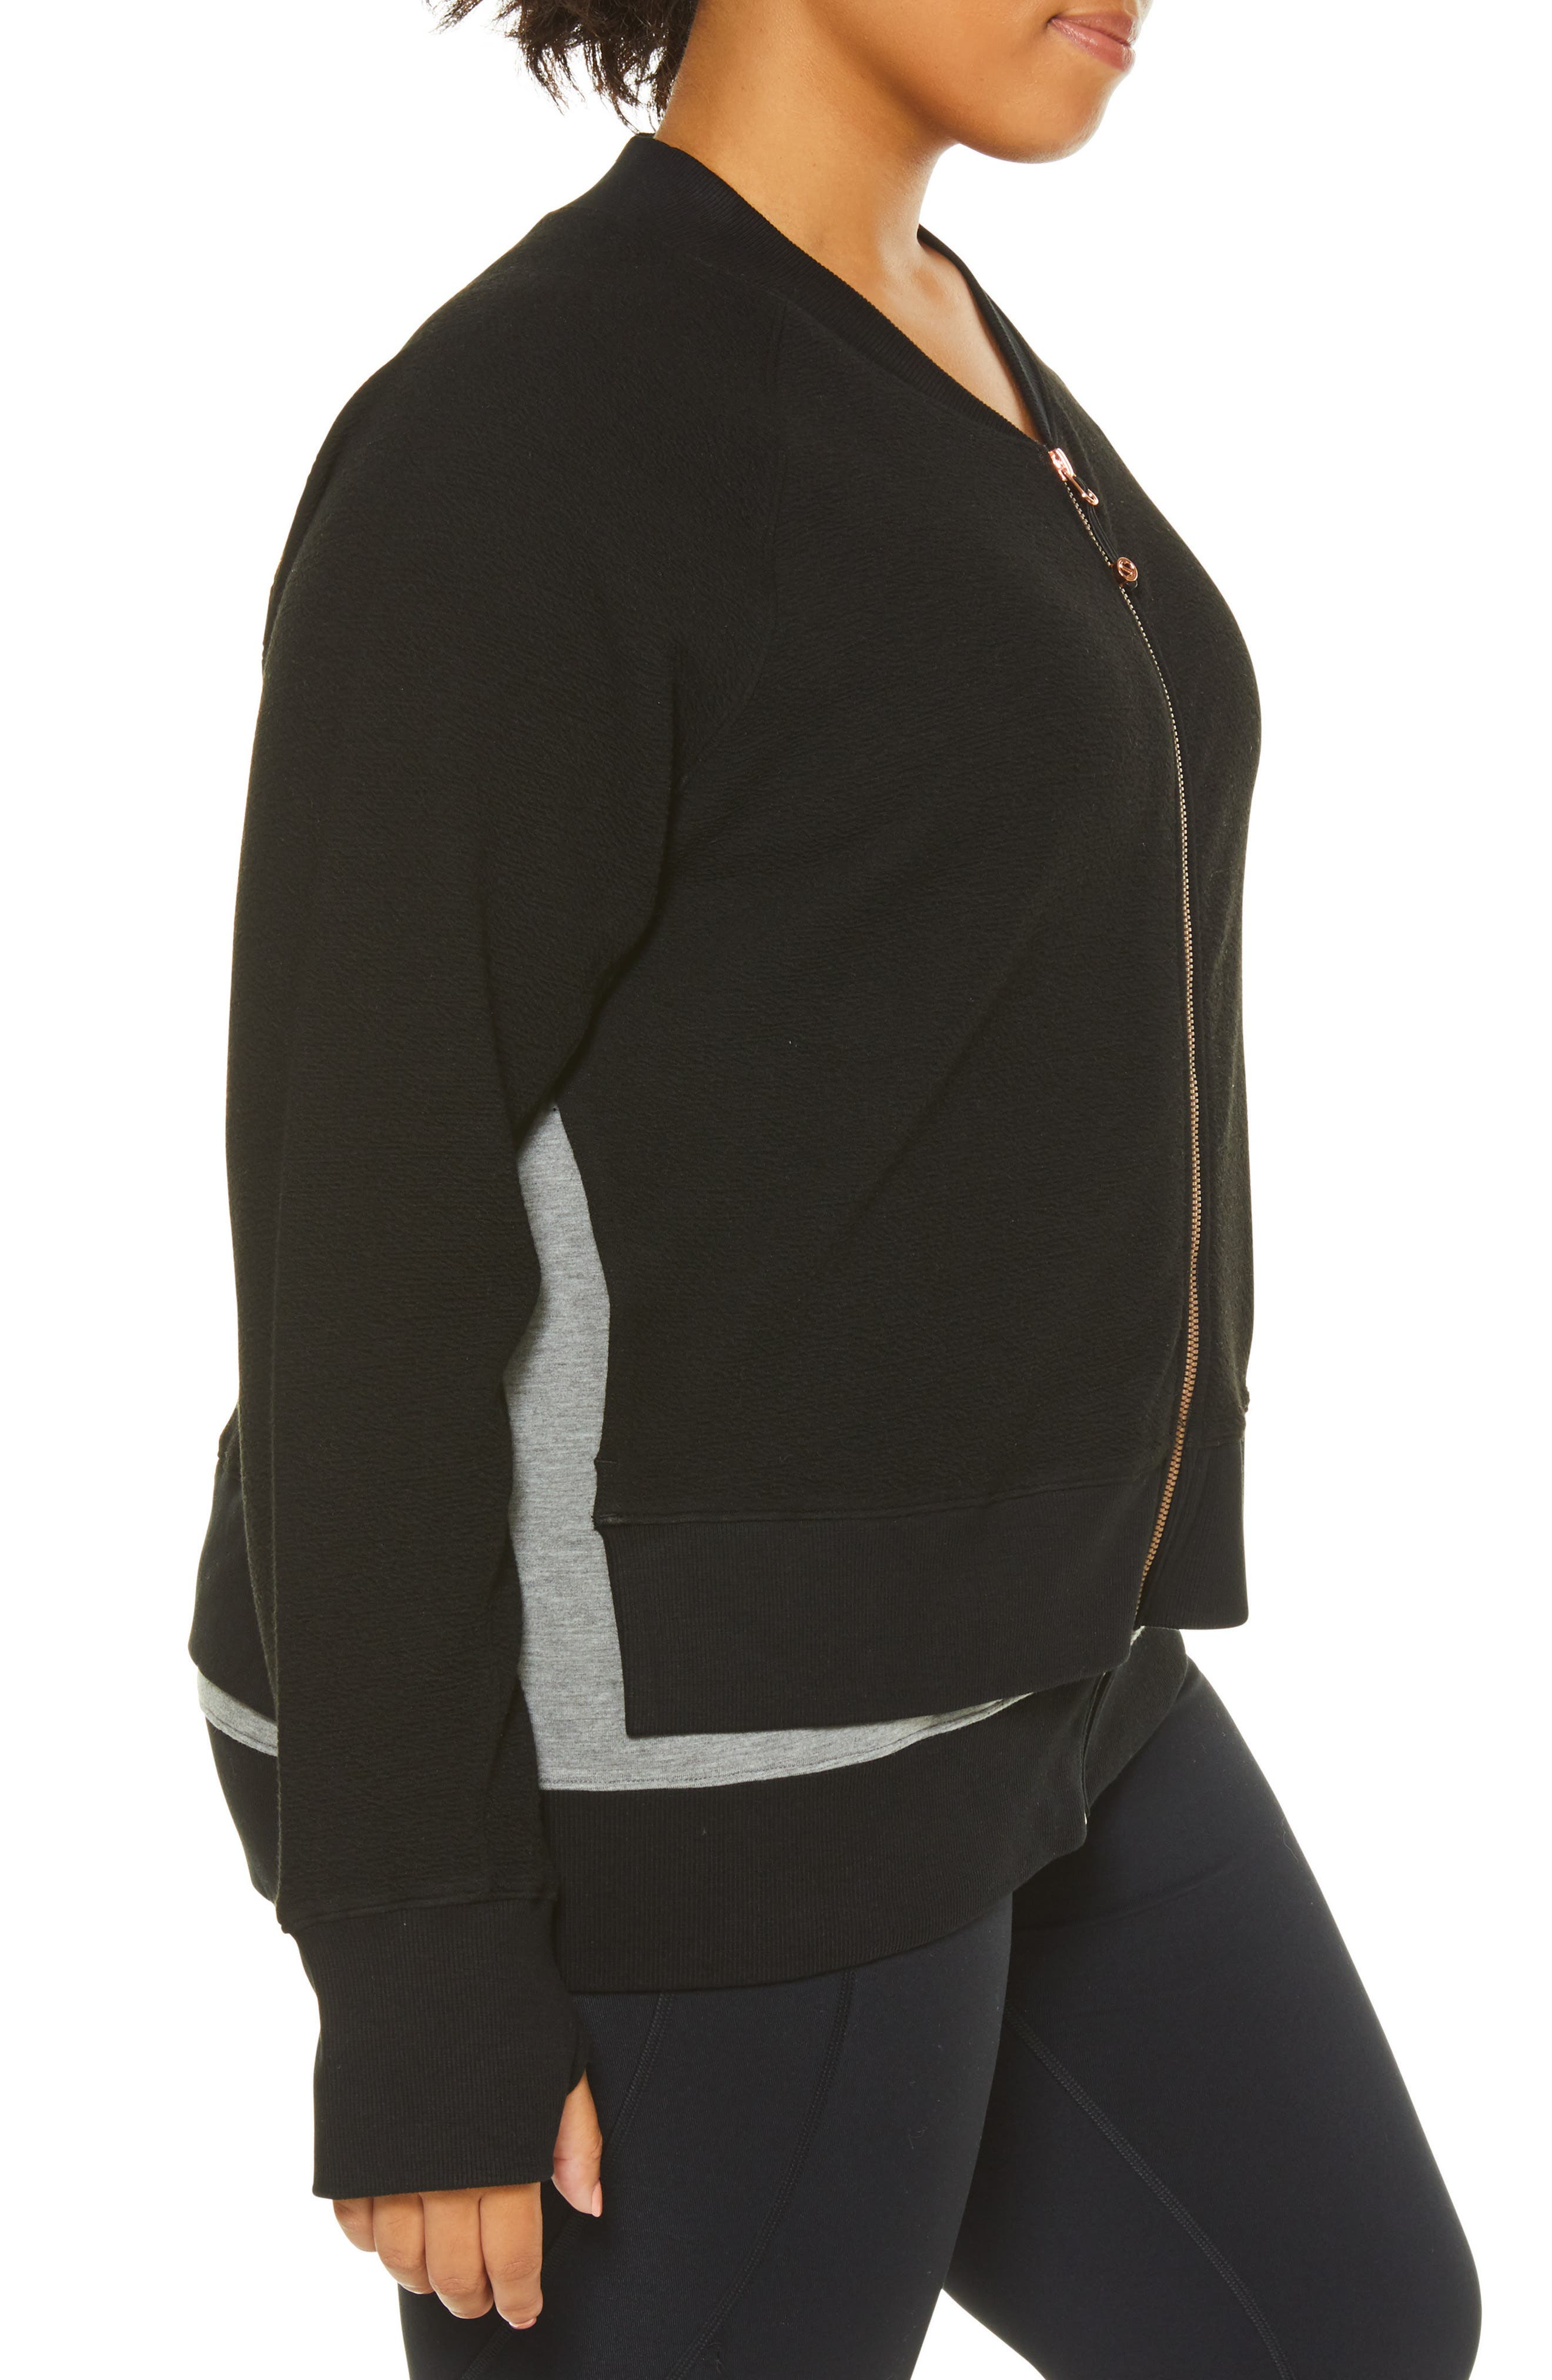 Sublime Double Layer Jacket,                             Alternate thumbnail 3, color,                             BLACK/ GREY HEATHER